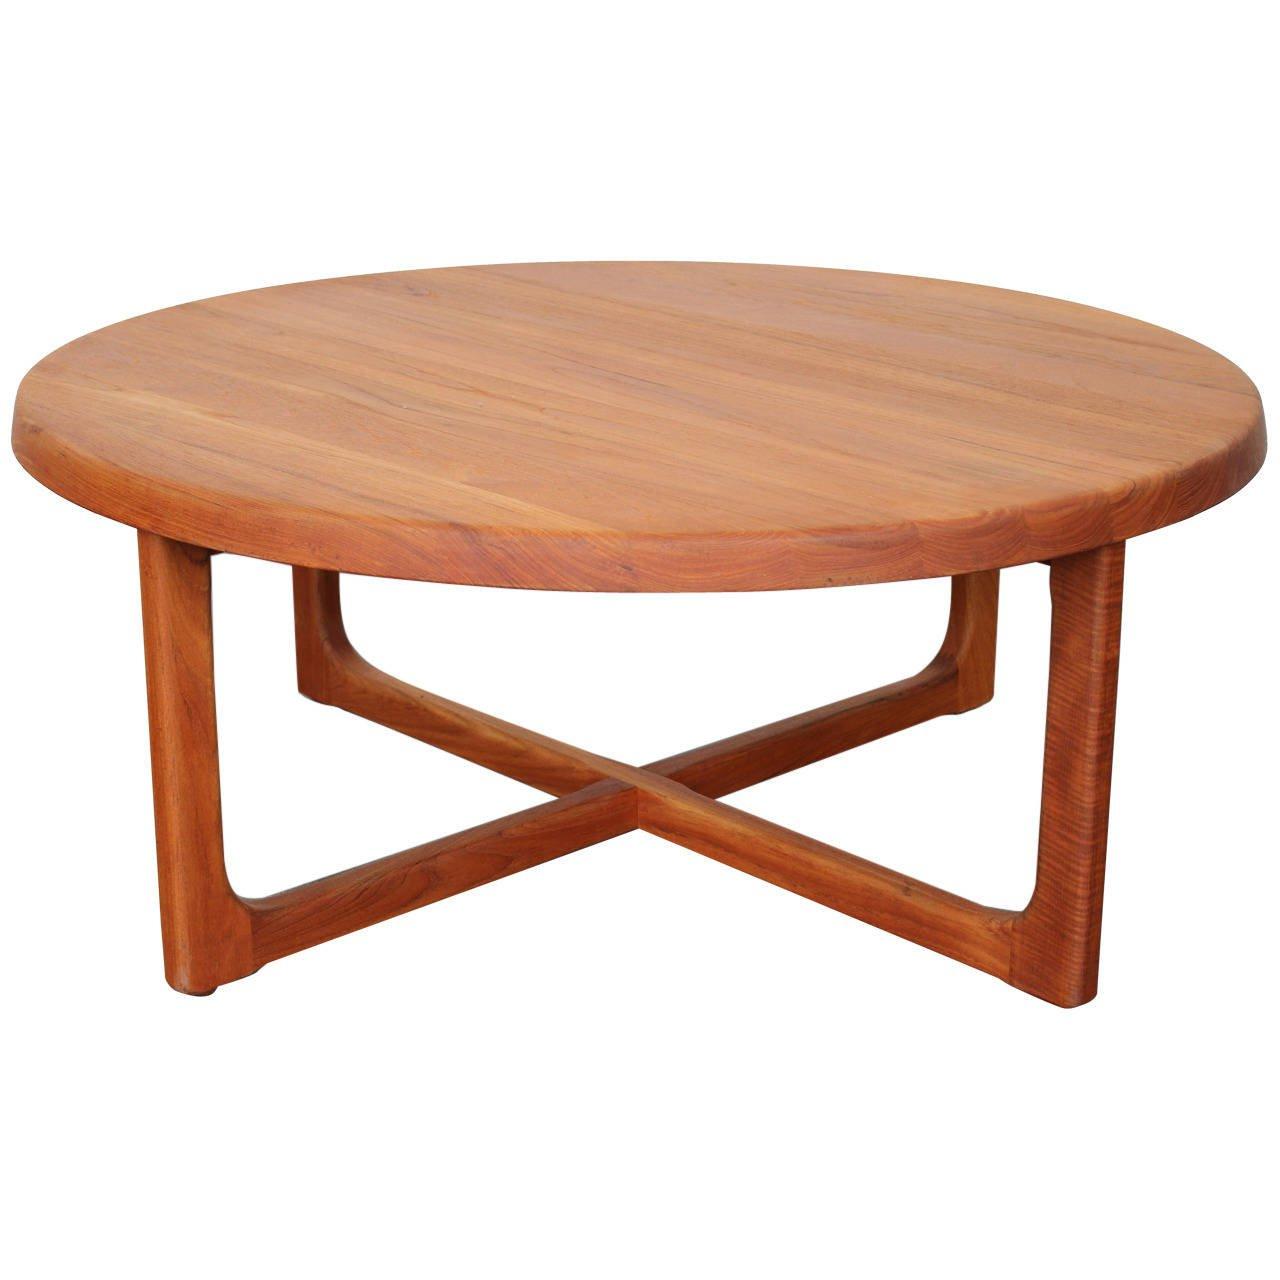 Round Teak Coffee Tables